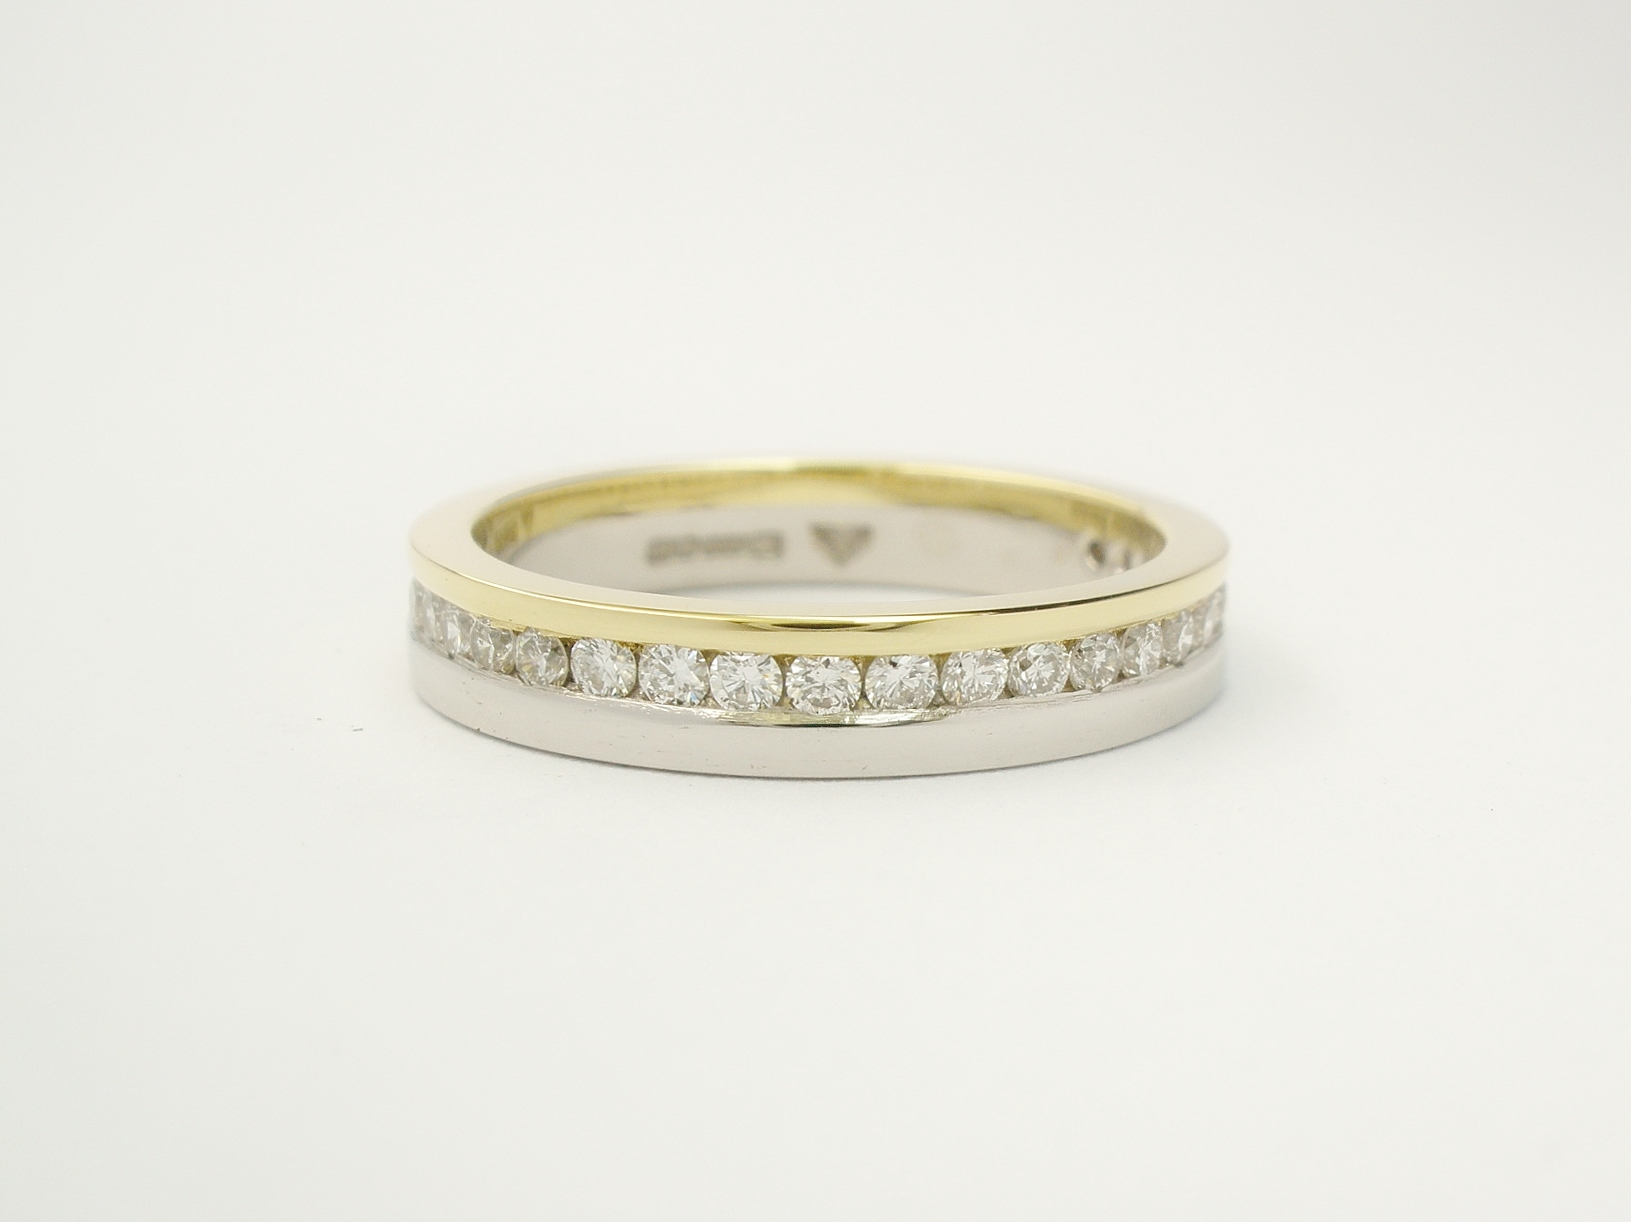 18ct. yellow gold & platinum off-set brilliant cut diamond wedding ring.